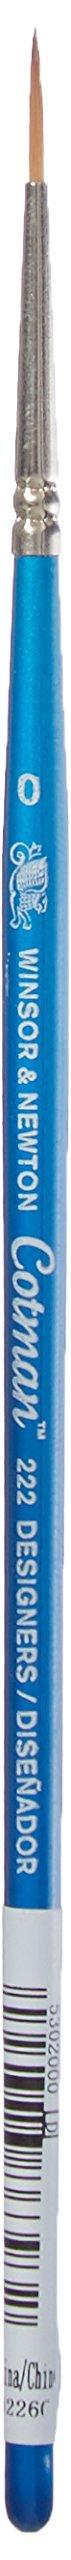 Winsor & Newton Cotman Water Colour Series 222 Short Handle Synthetic Brush - Designers' #0 (Color: Blue, Tamaño: #0)